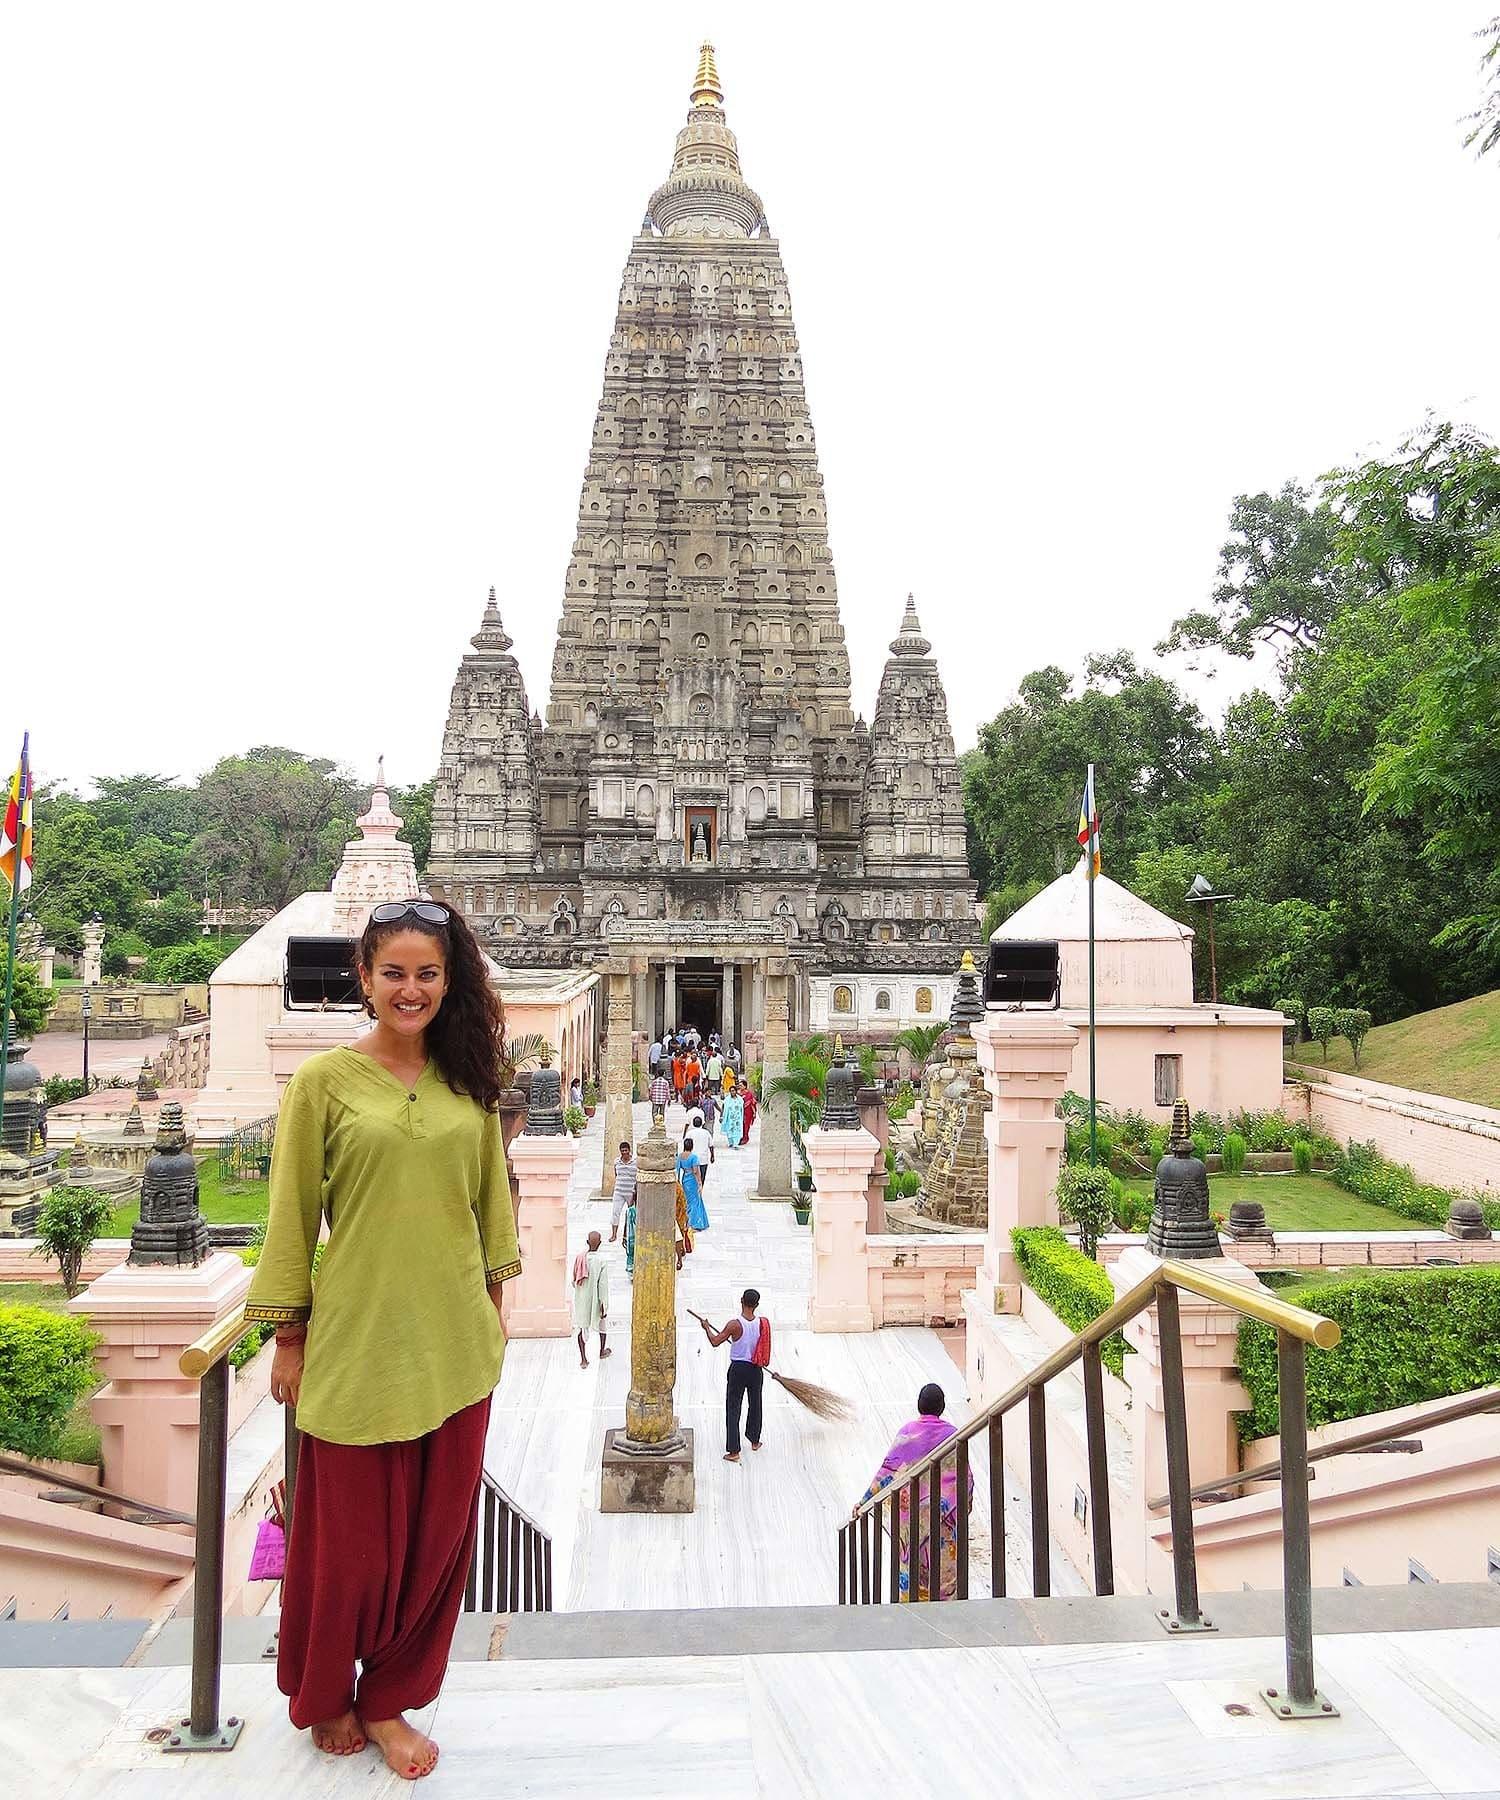 Mahabodhi temple in Bodhgaya.